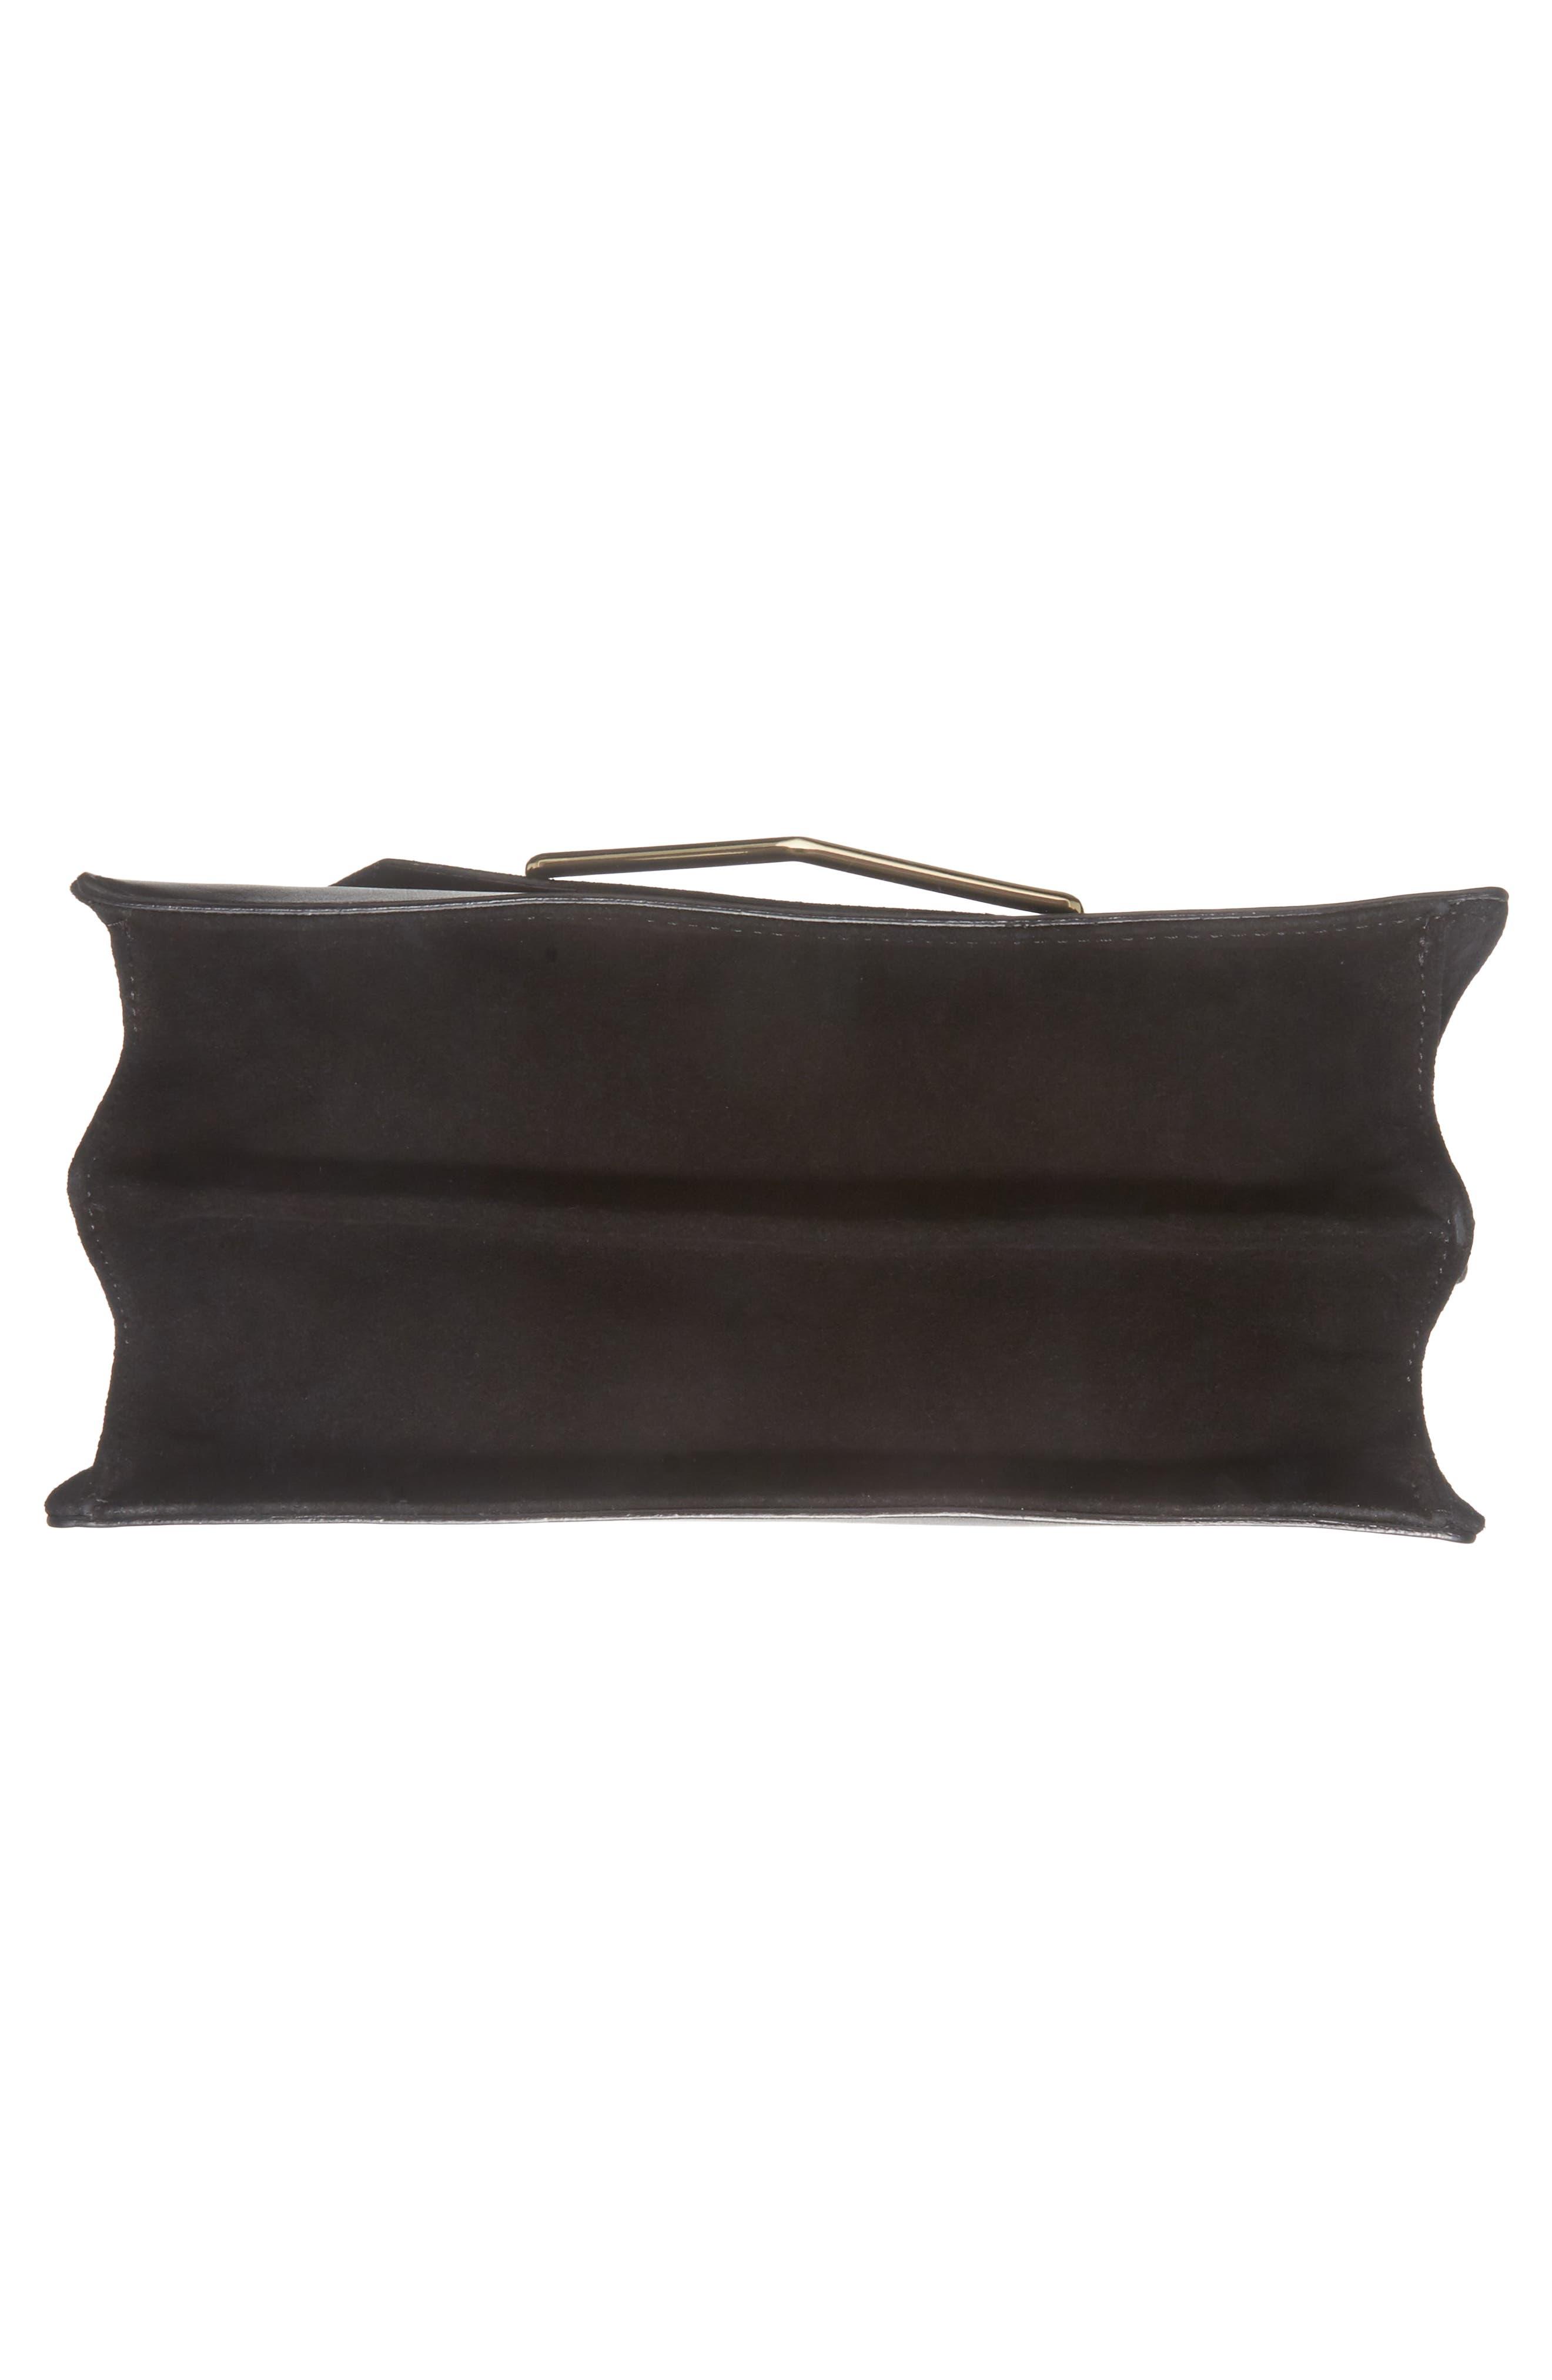 Premium Leather & Suede Soko Shoulder Bag,                             Alternate thumbnail 6, color,                             Black